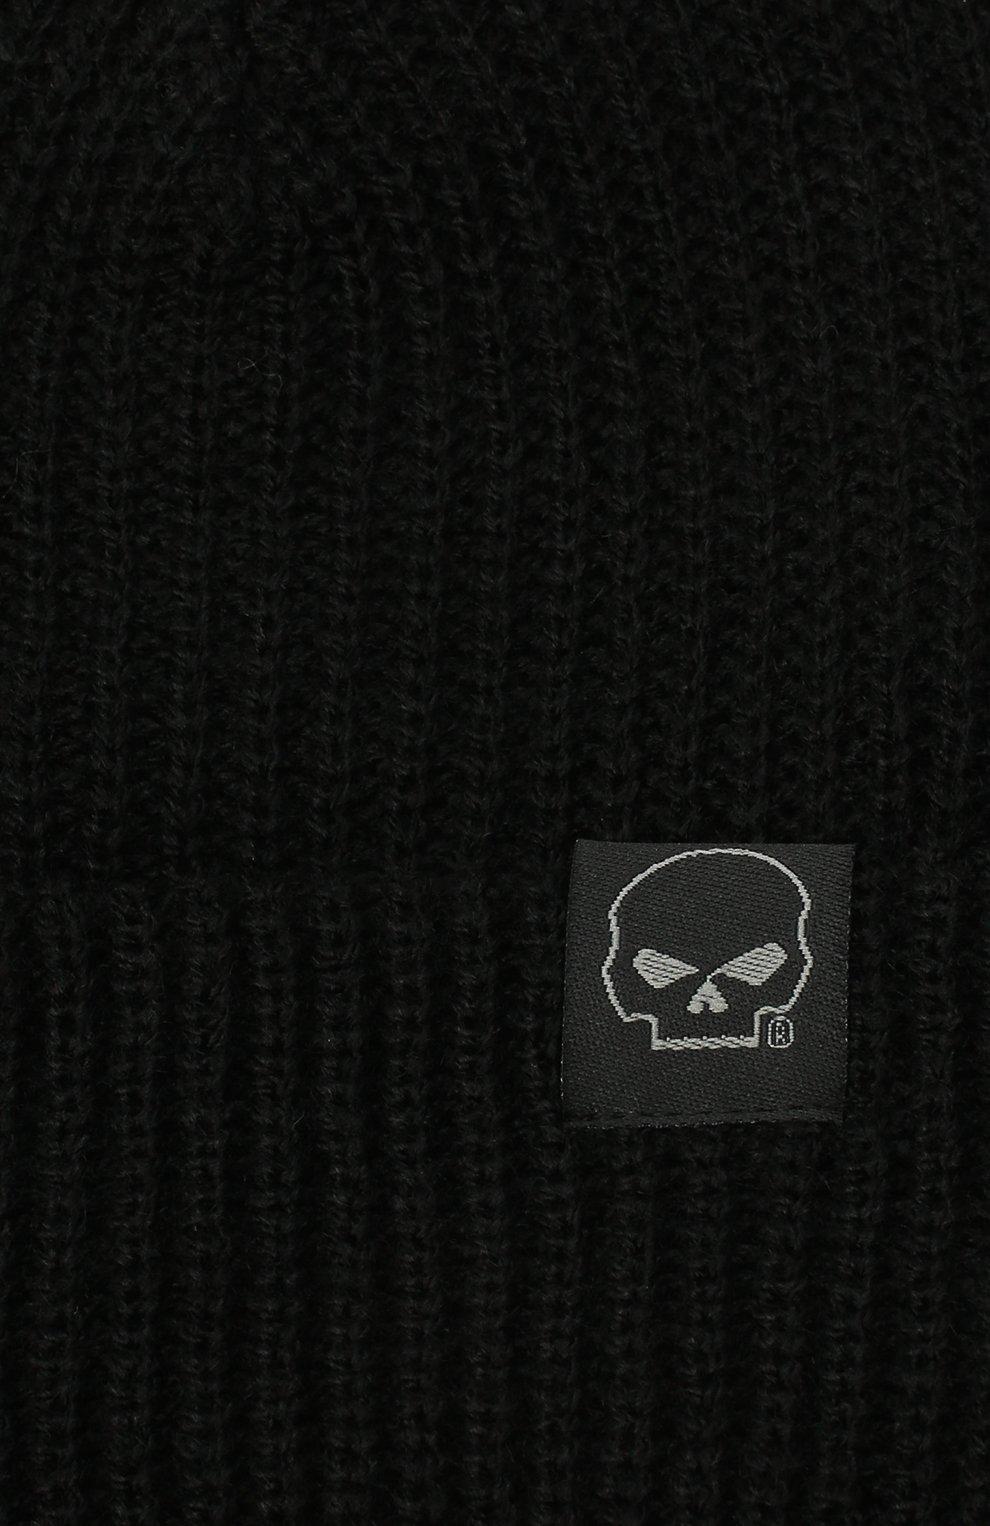 Мужская шапка HARLEY-DAVIDSON черного цвета, арт. 97601-21VM | Фото 3 (Материал: Текстиль, Синтетический материал; Кросс-КТ: Трикотаж)